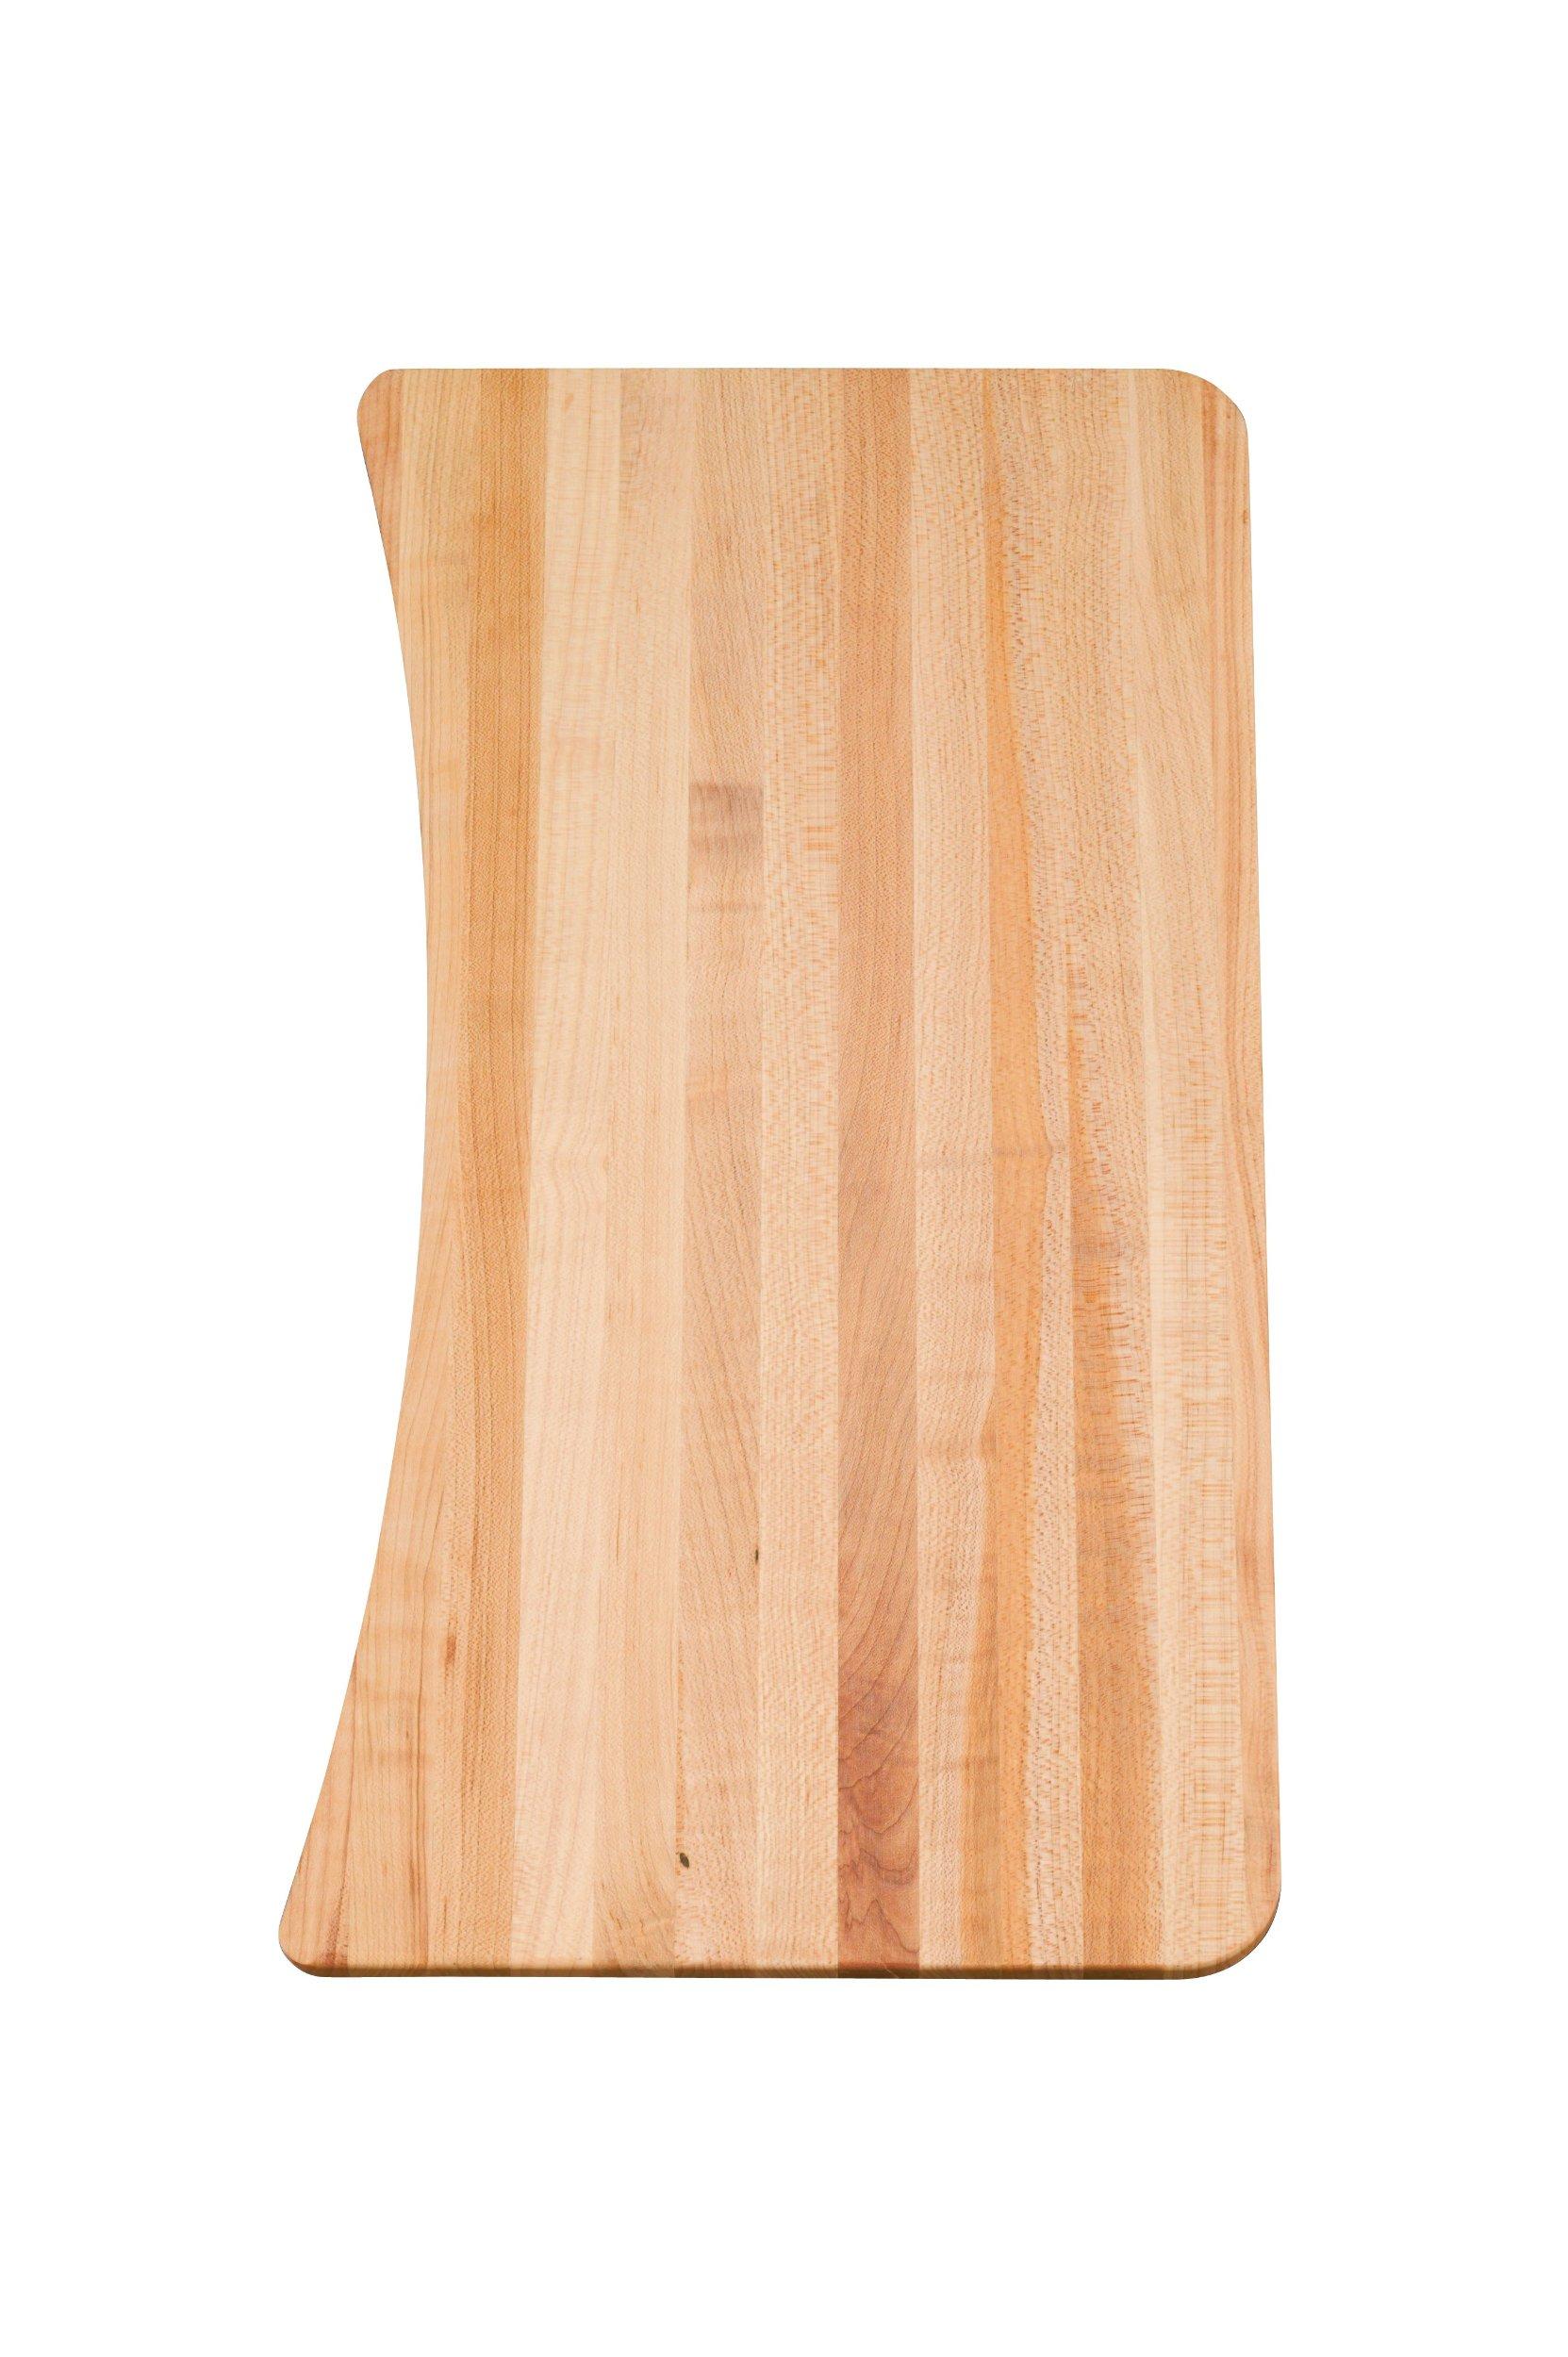 KOHLER K-6507-NA Hardwood Cutting Board by Kohler